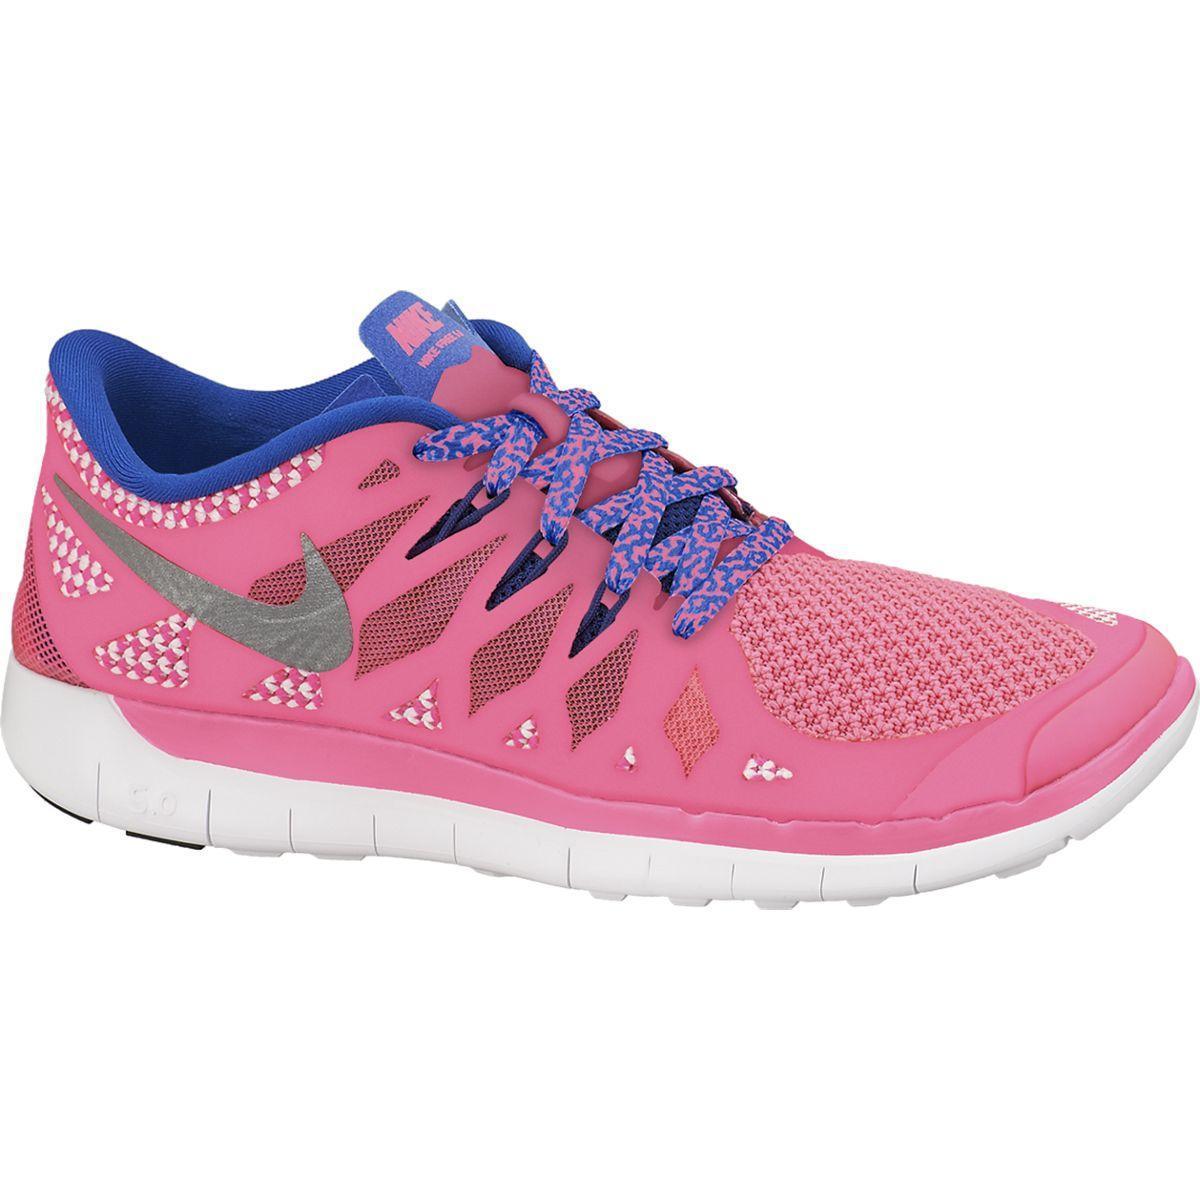 huge selection of 162e5 0ebbd Nike Girls Free 5.0+ Running Shoes - Hyper Pink Hyper Cobalt -  Tennisnuts.com